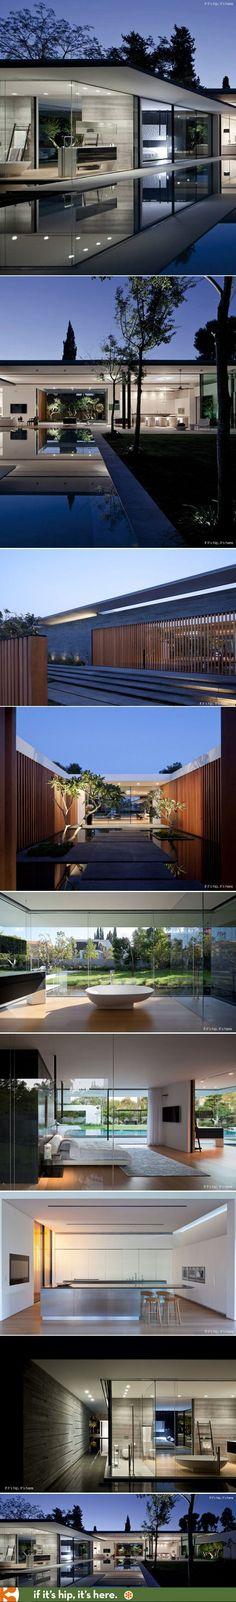 The Phenomenal Float House.